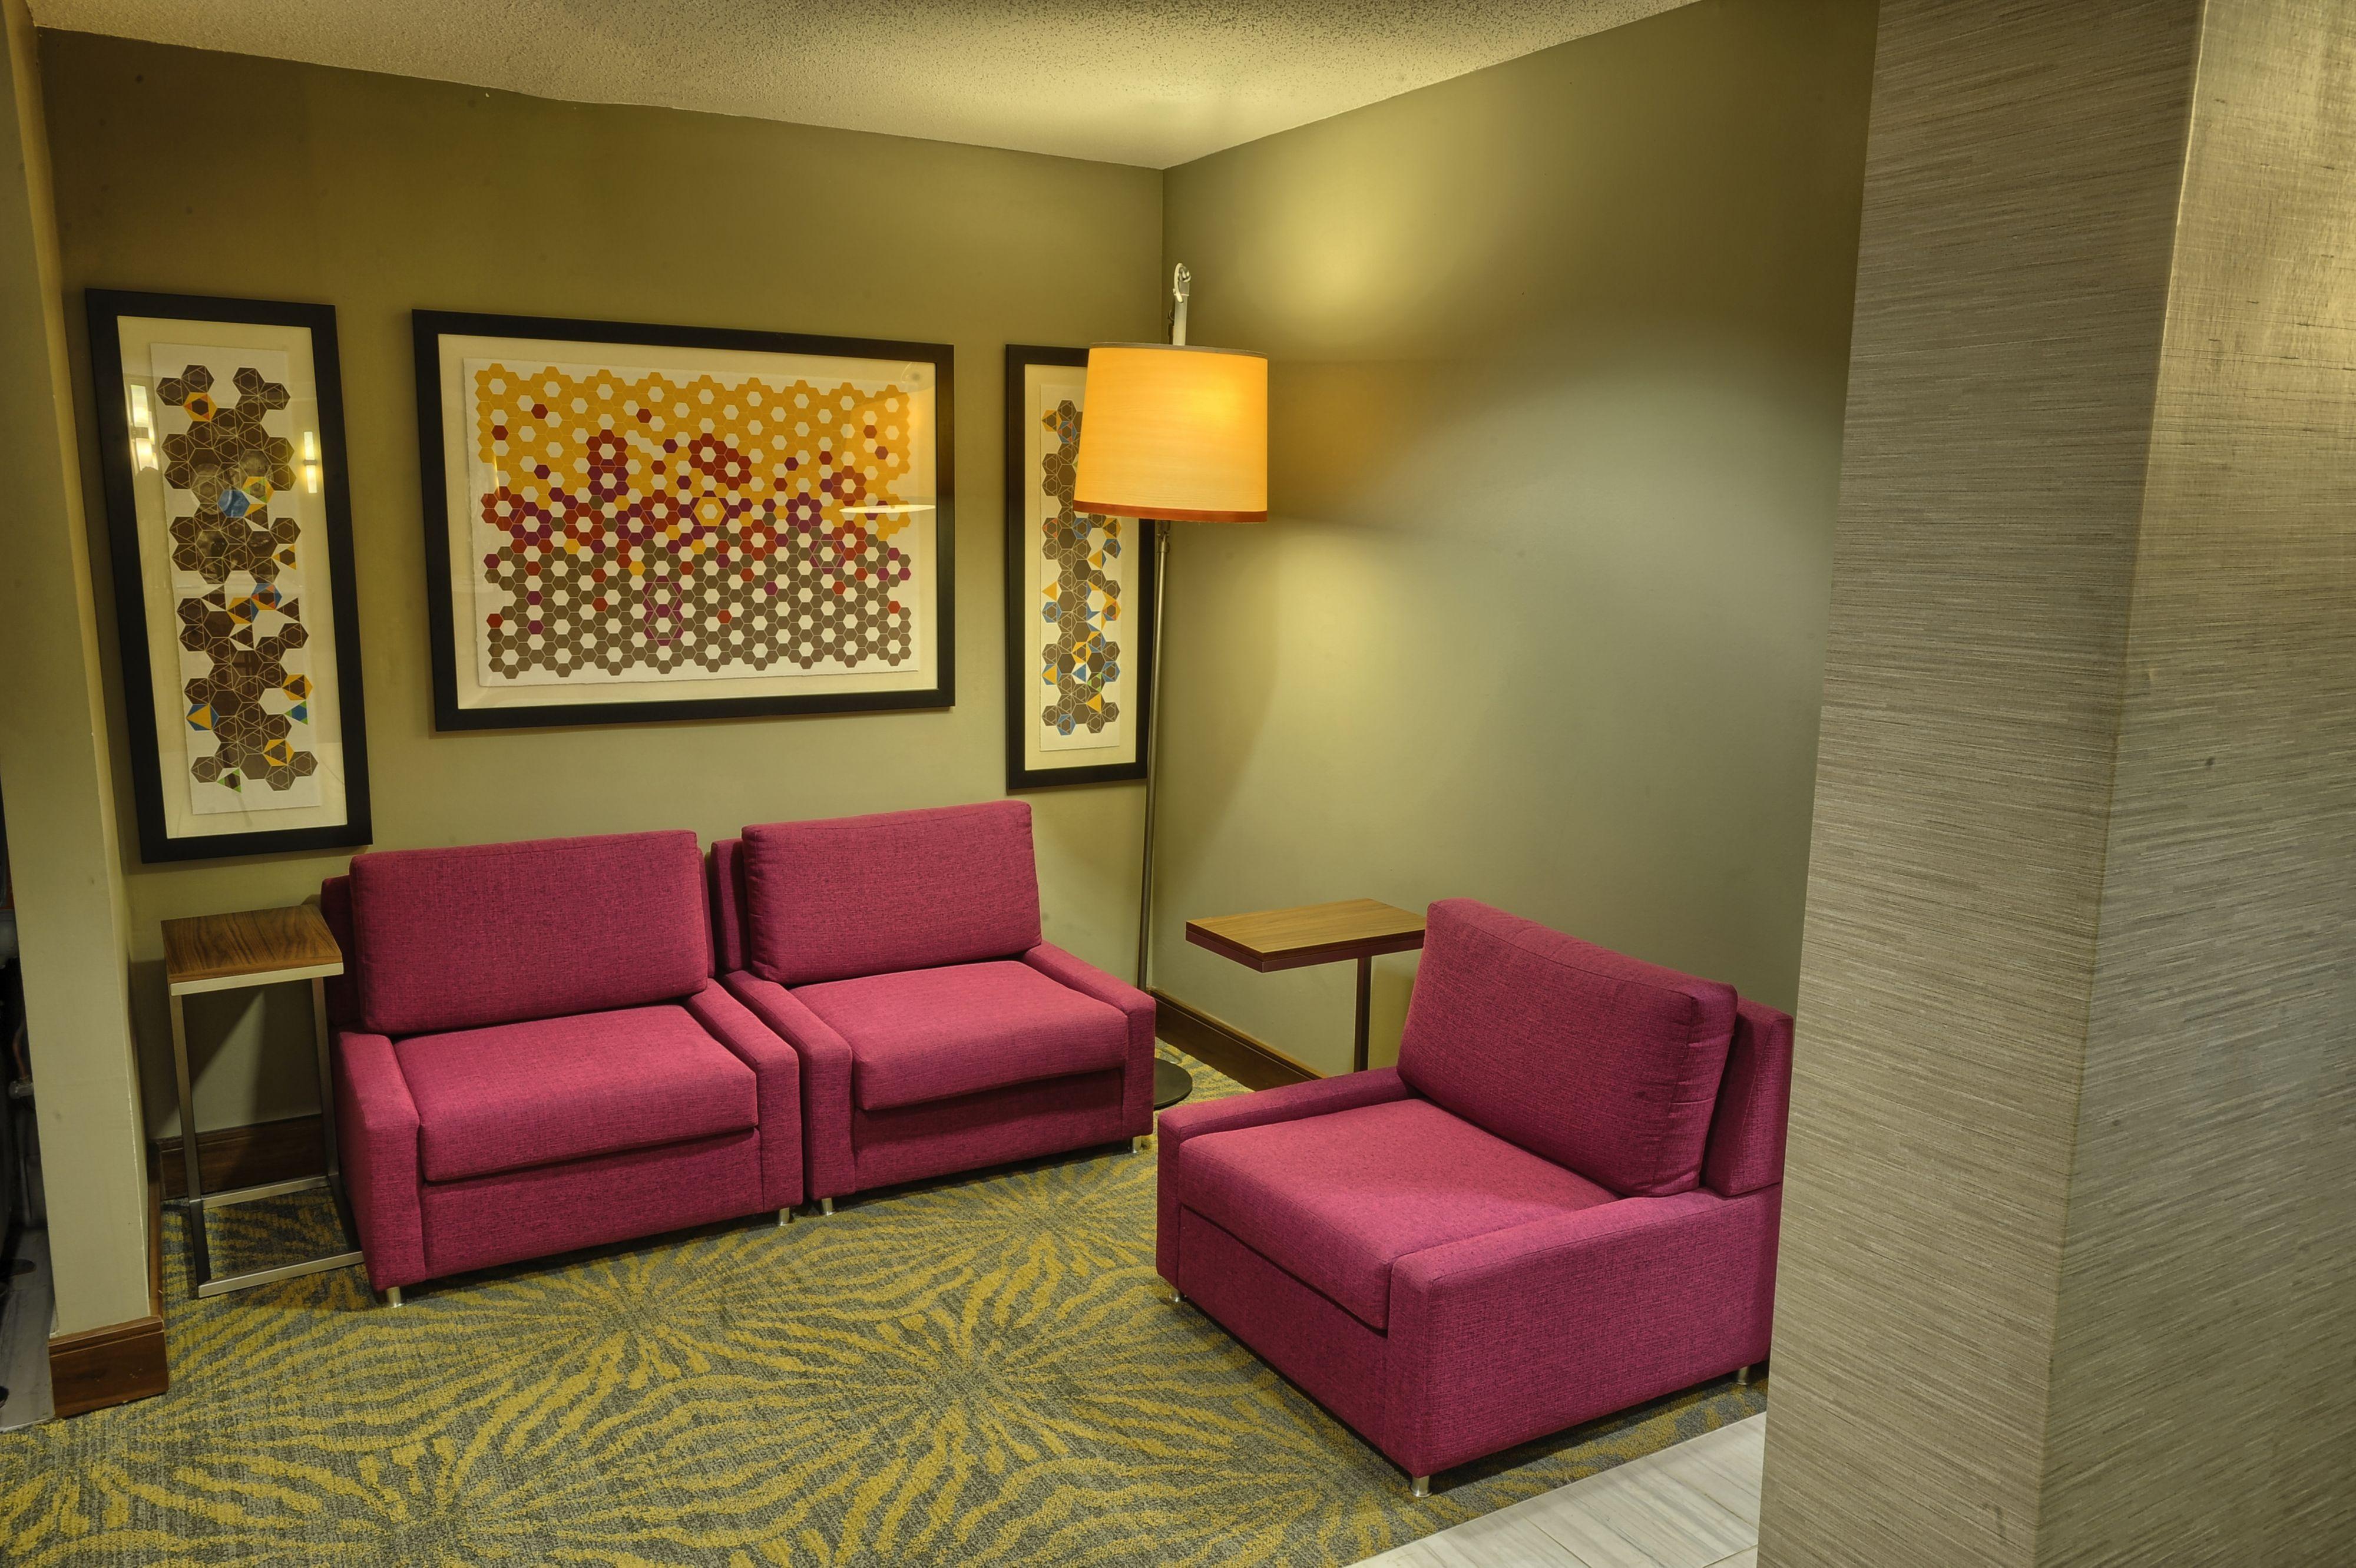 Holiday Inn Express Pell City image 7